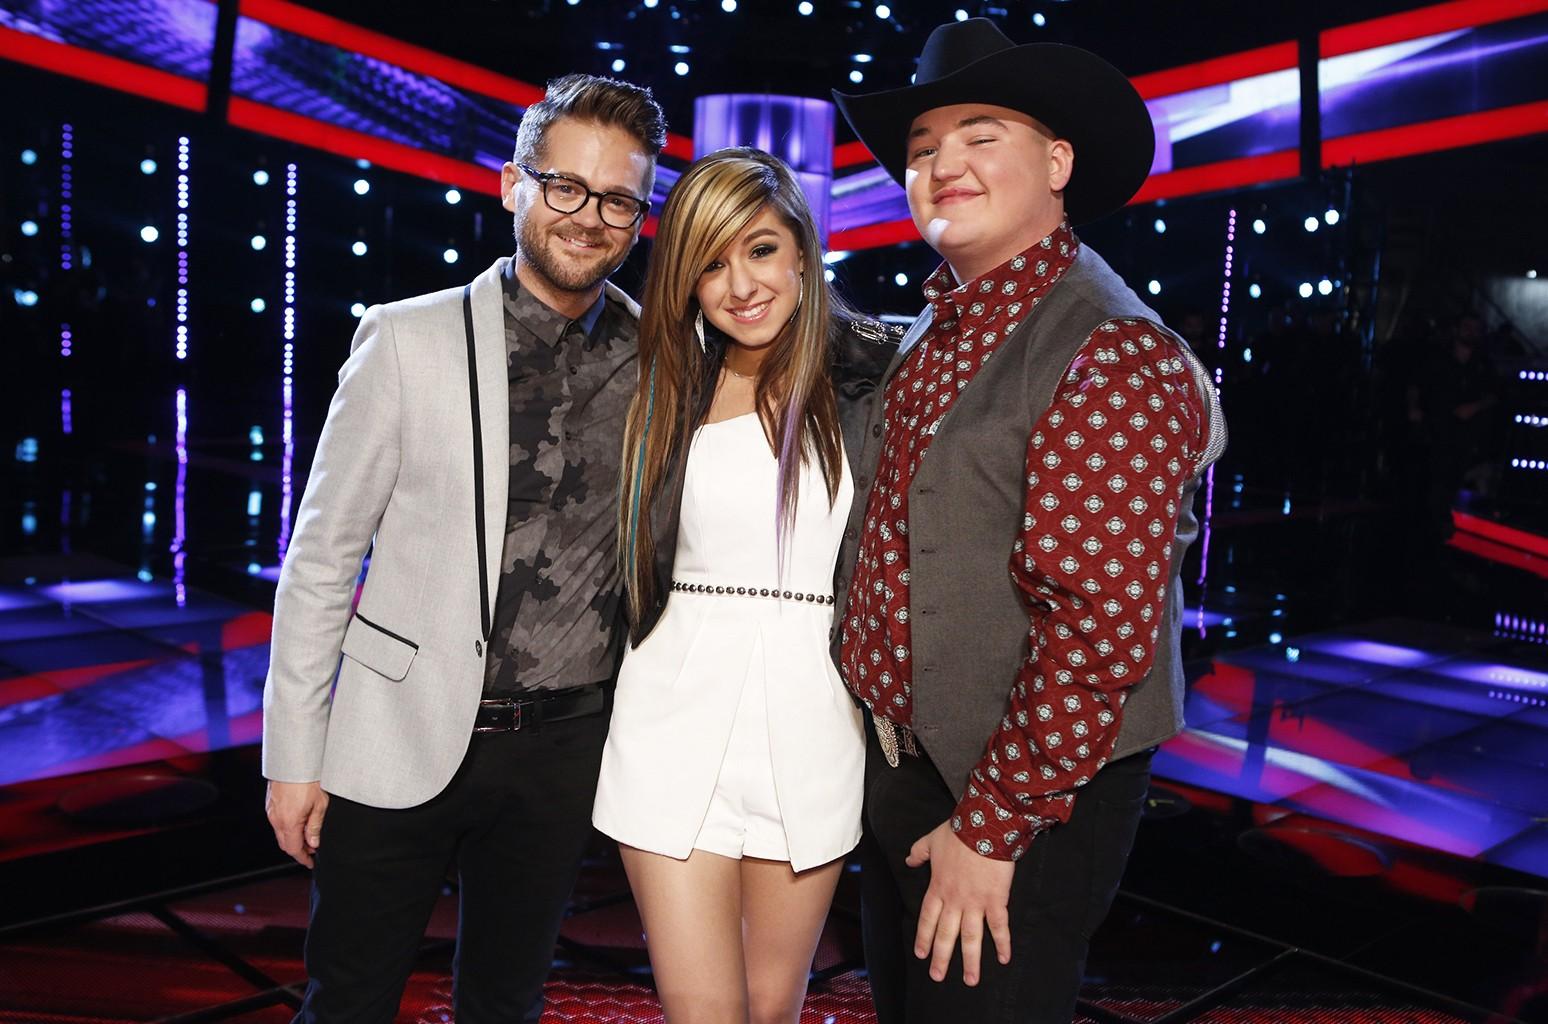 Josh Kaufman, Christina Grimmie and Jake Worthington on The Voice.